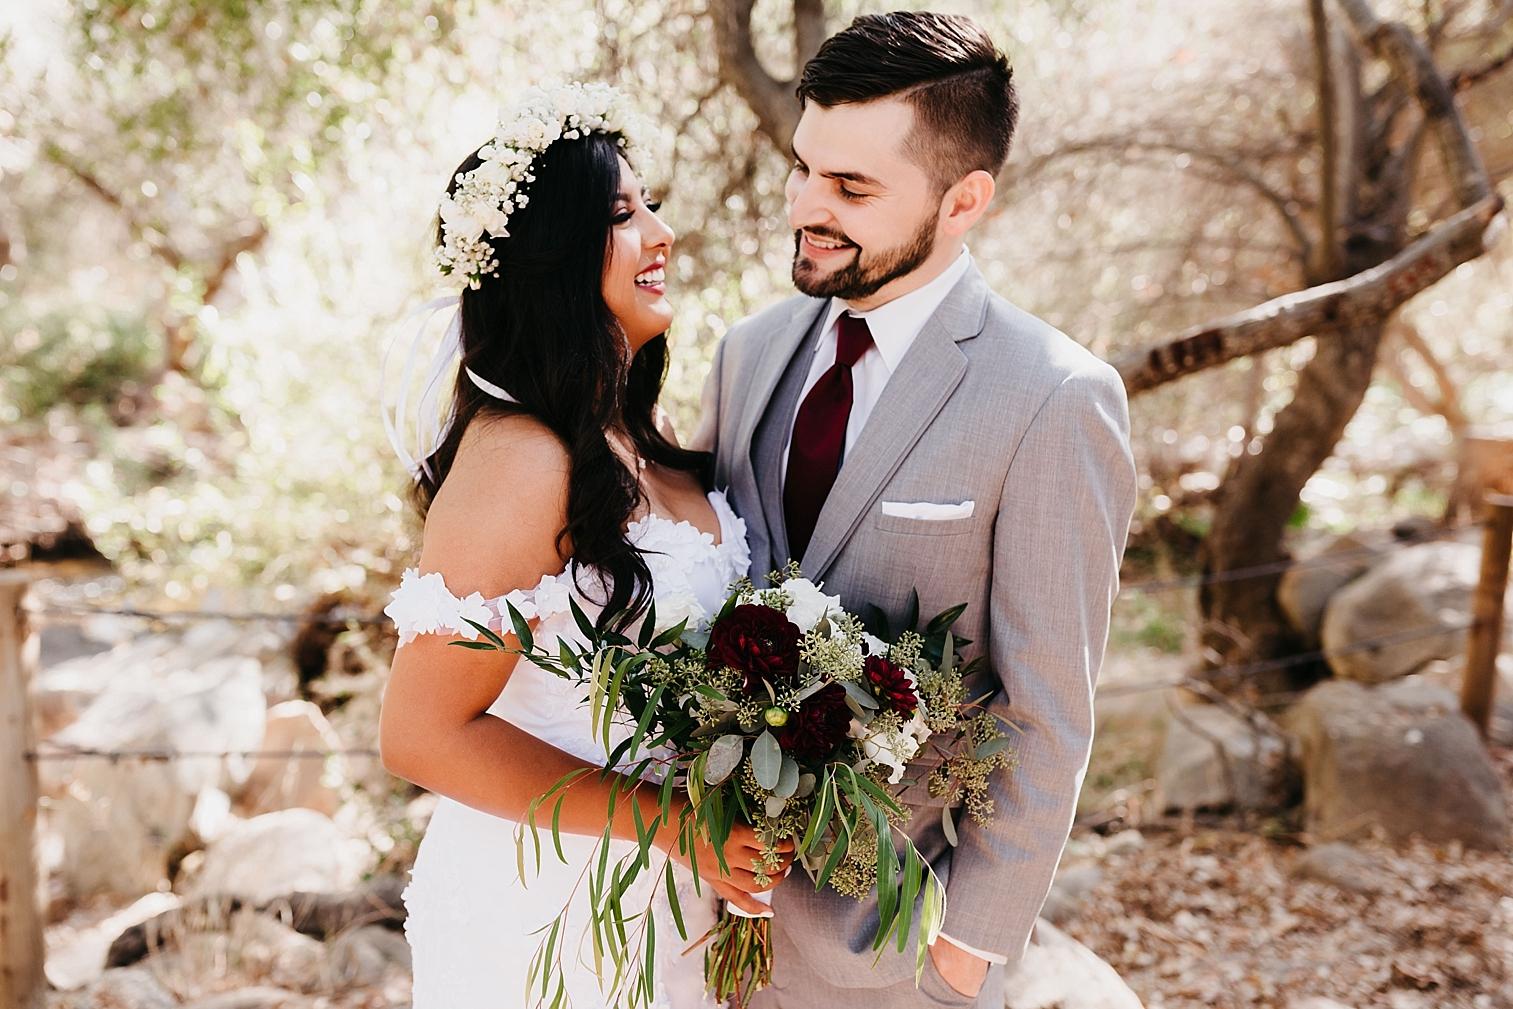 A bride and groom at their backyard wedding in Escondido